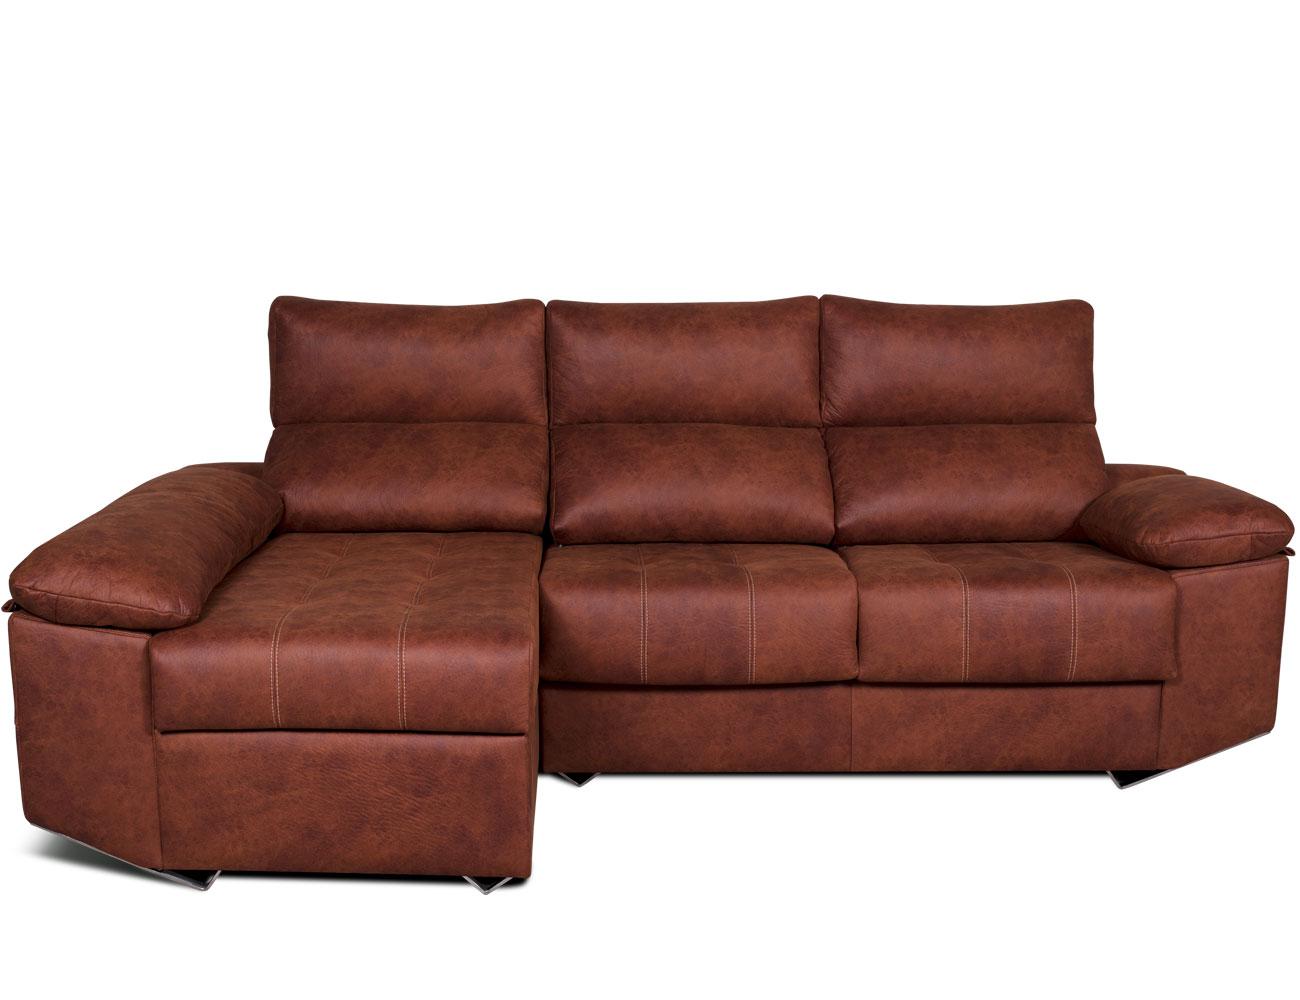 Sofa chaiselongue moderno patas forma tejido anti manchas 29